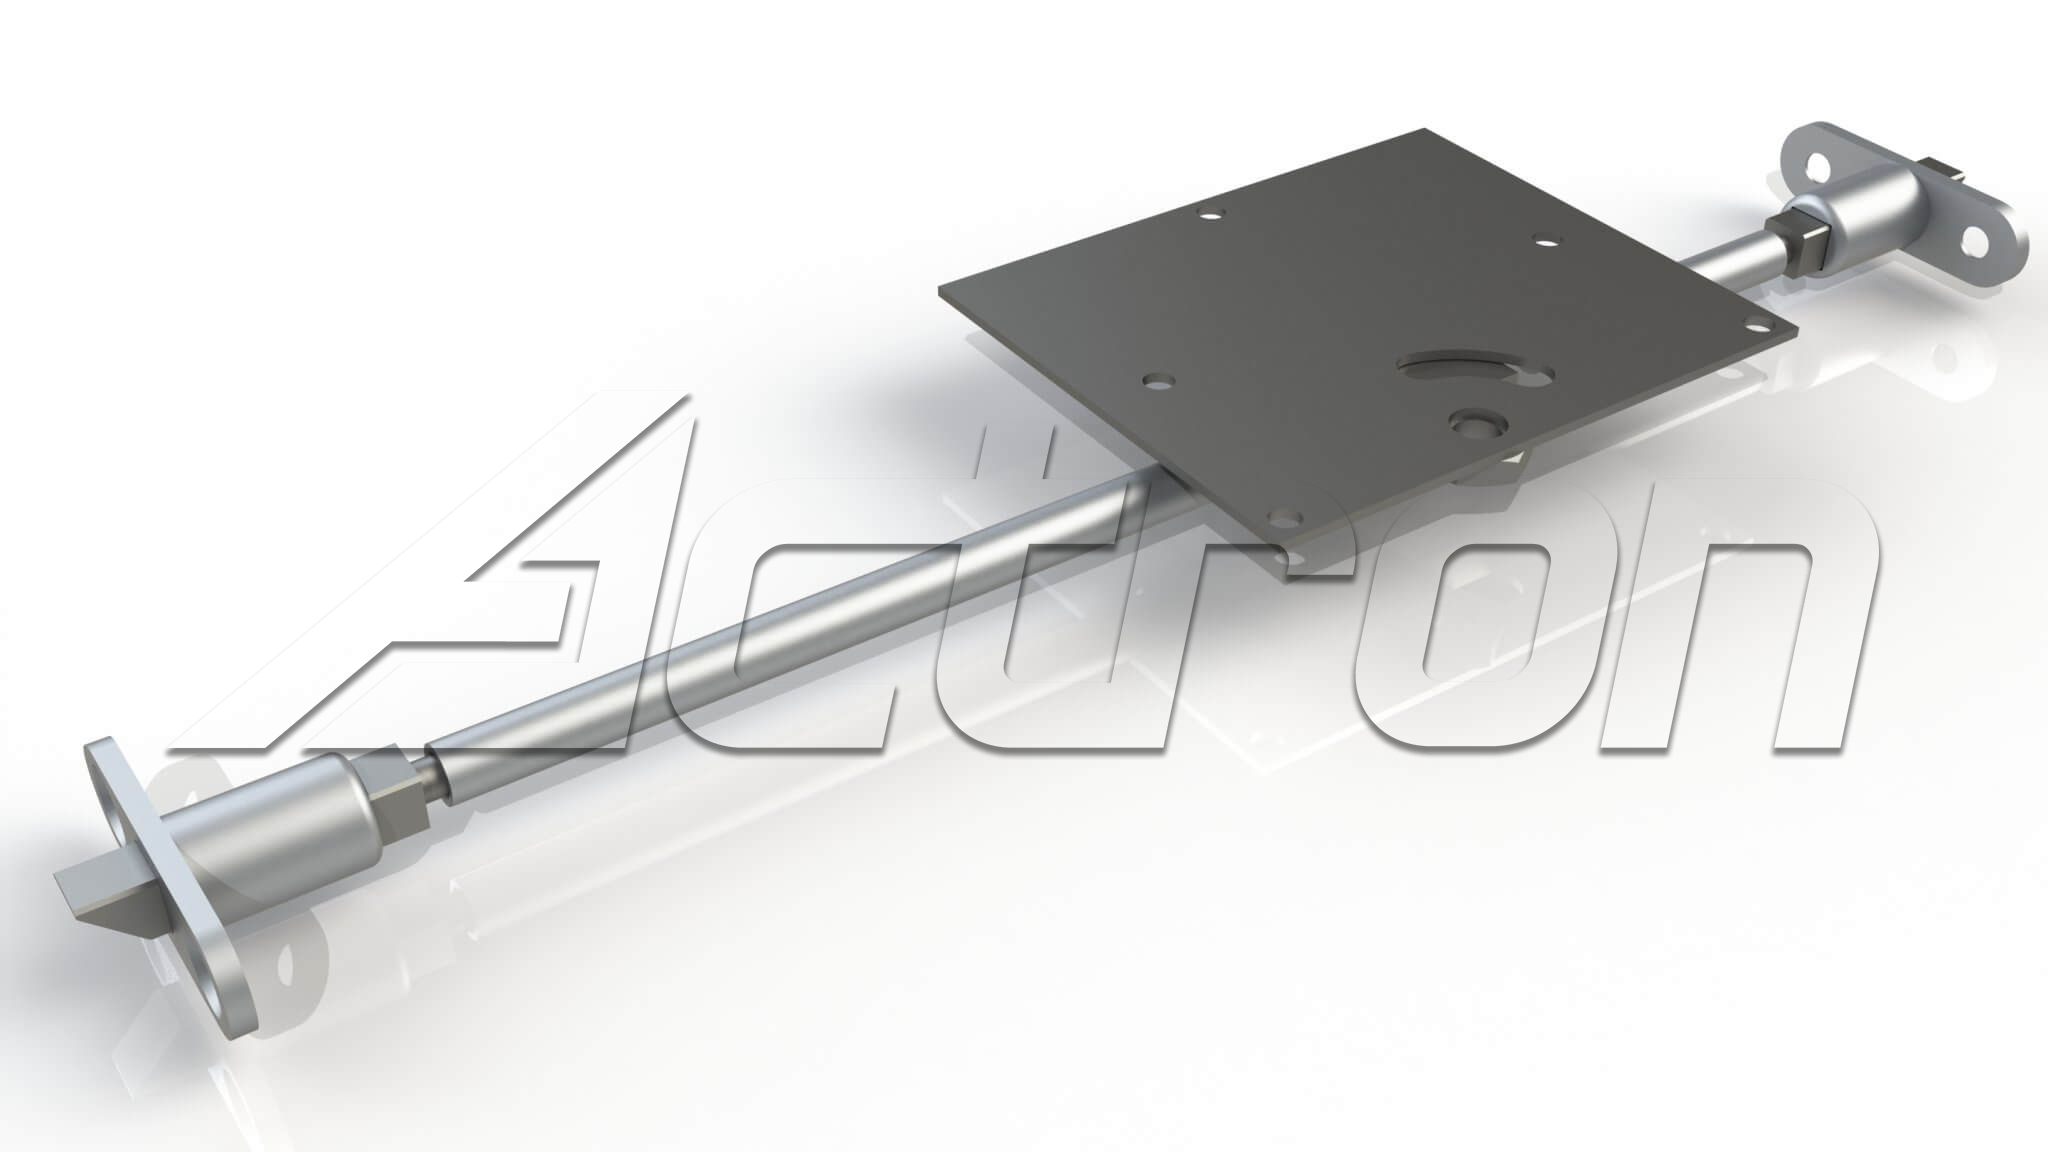 door-bolting-system-8211-lever-4444-a39116.jpg